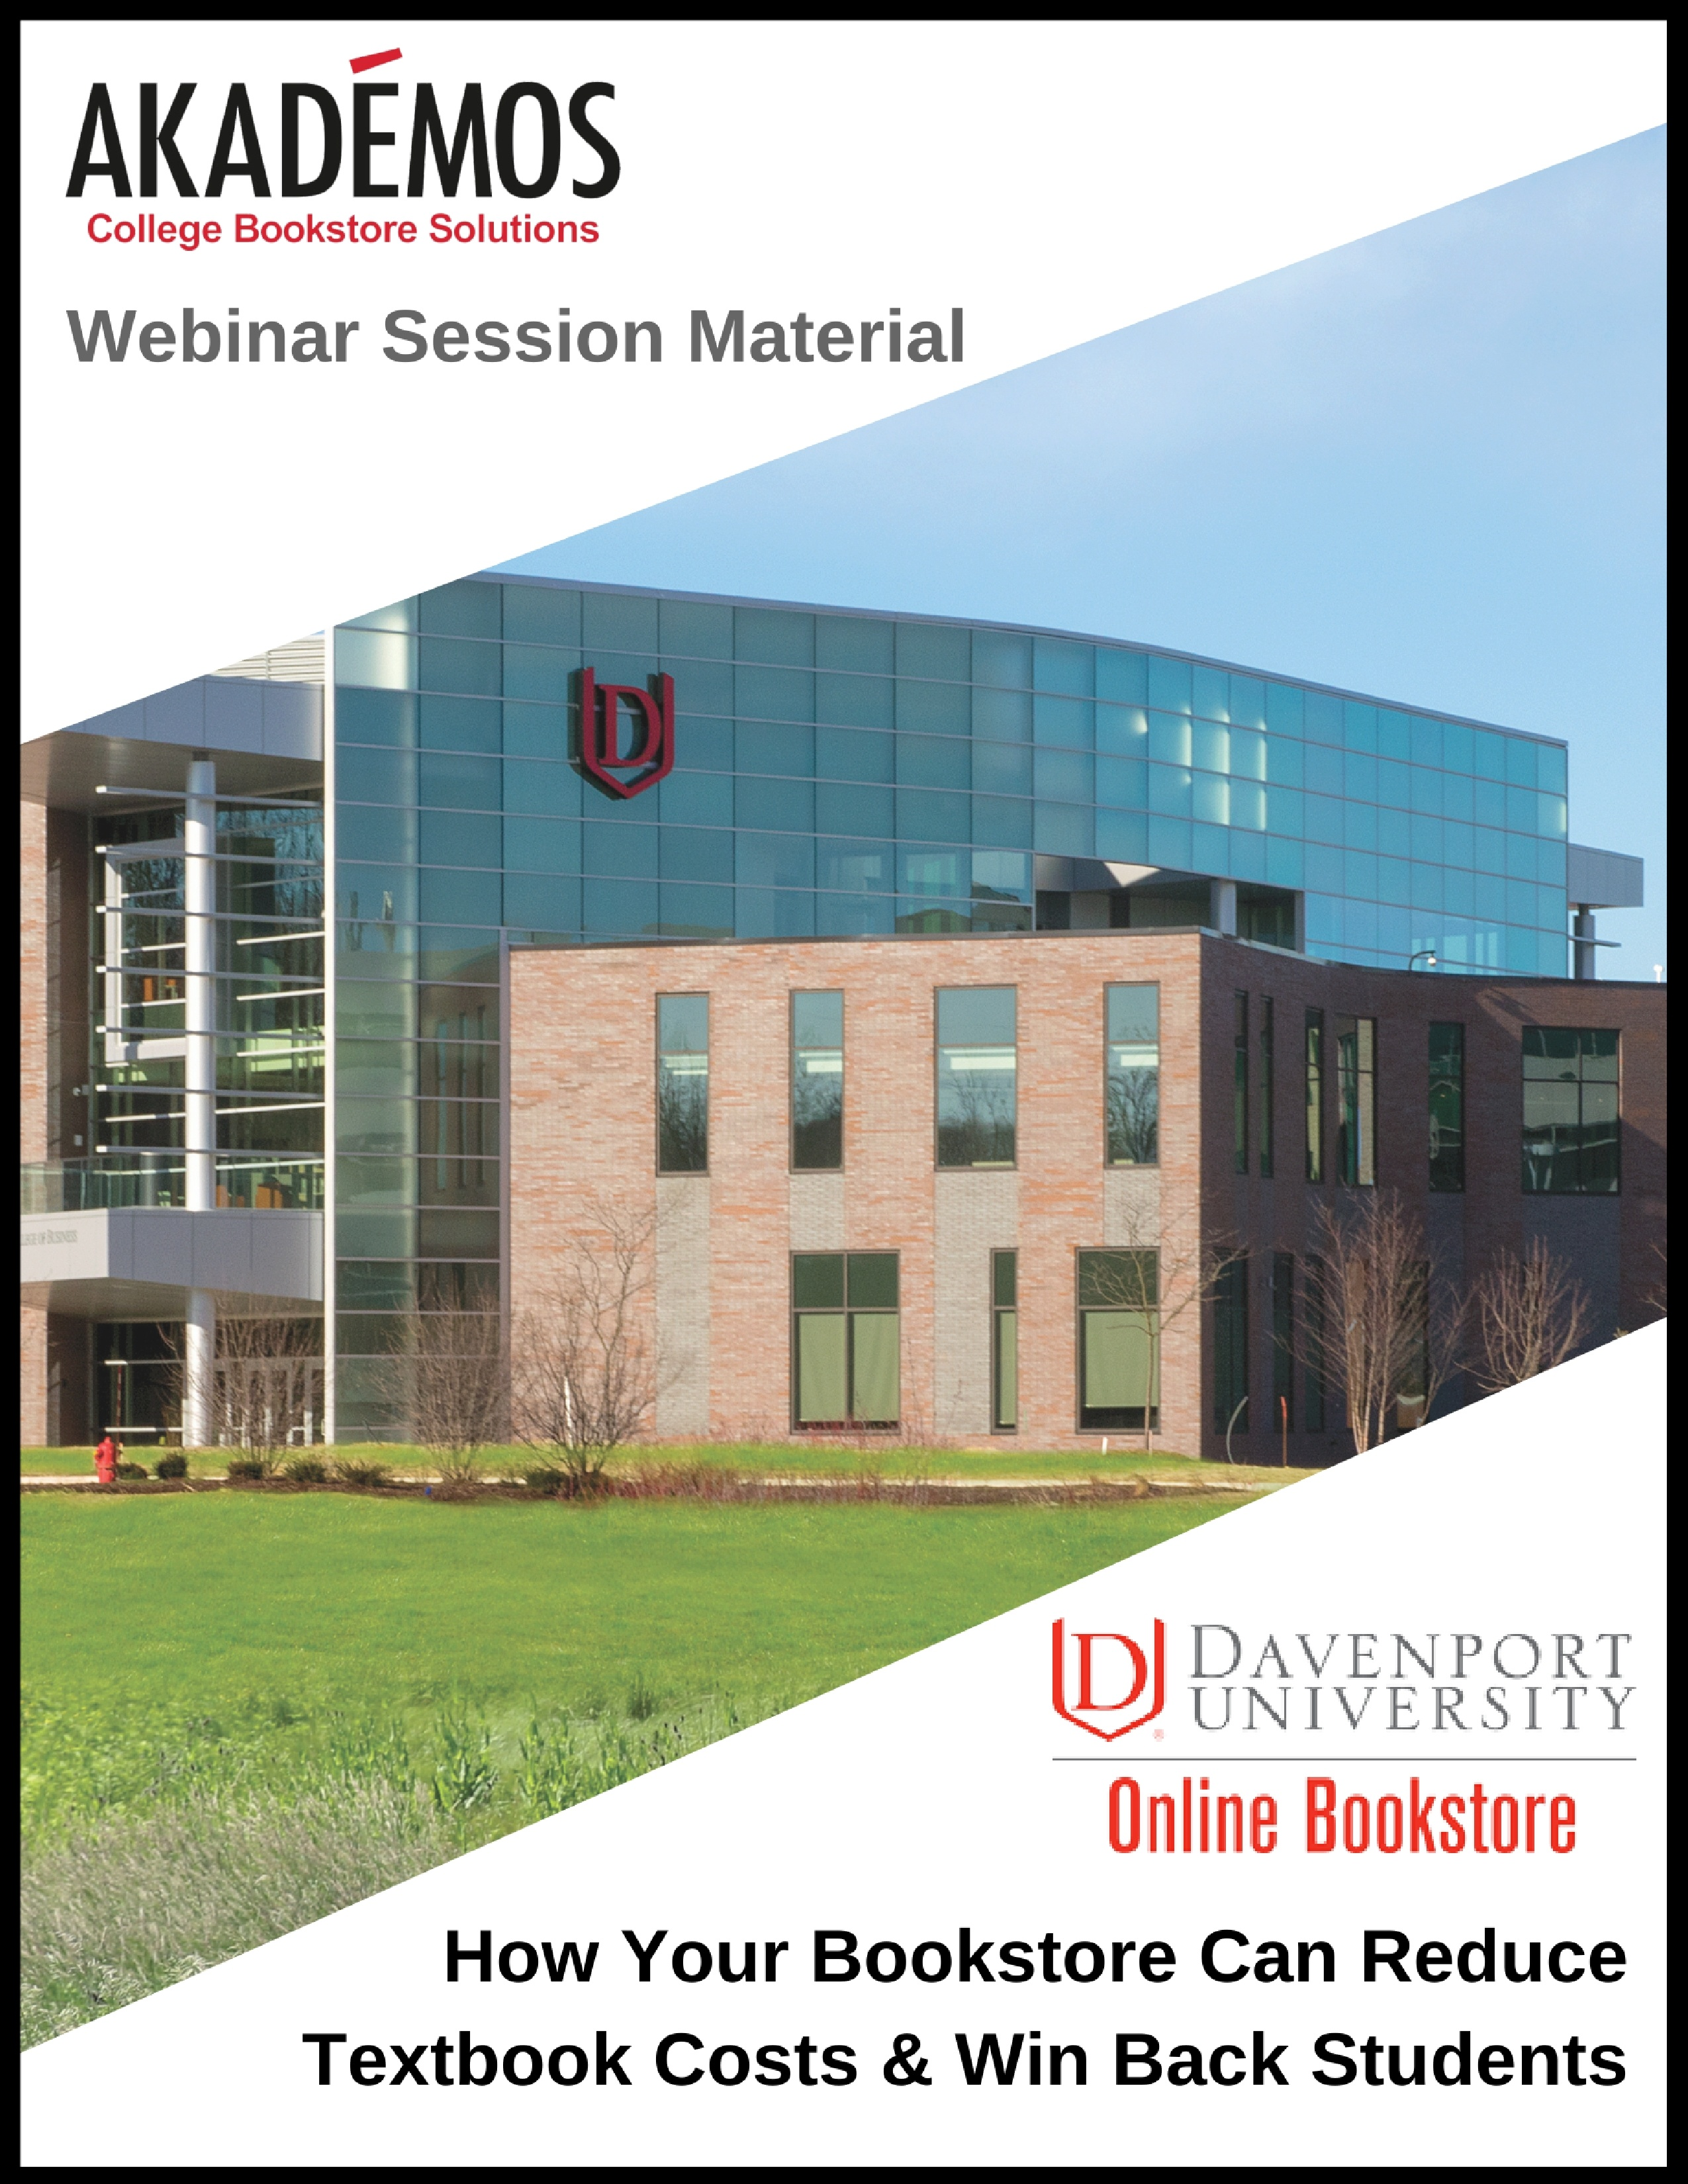 Copy of Davenport University Case Study CFO White Paper Cover (3).jpg